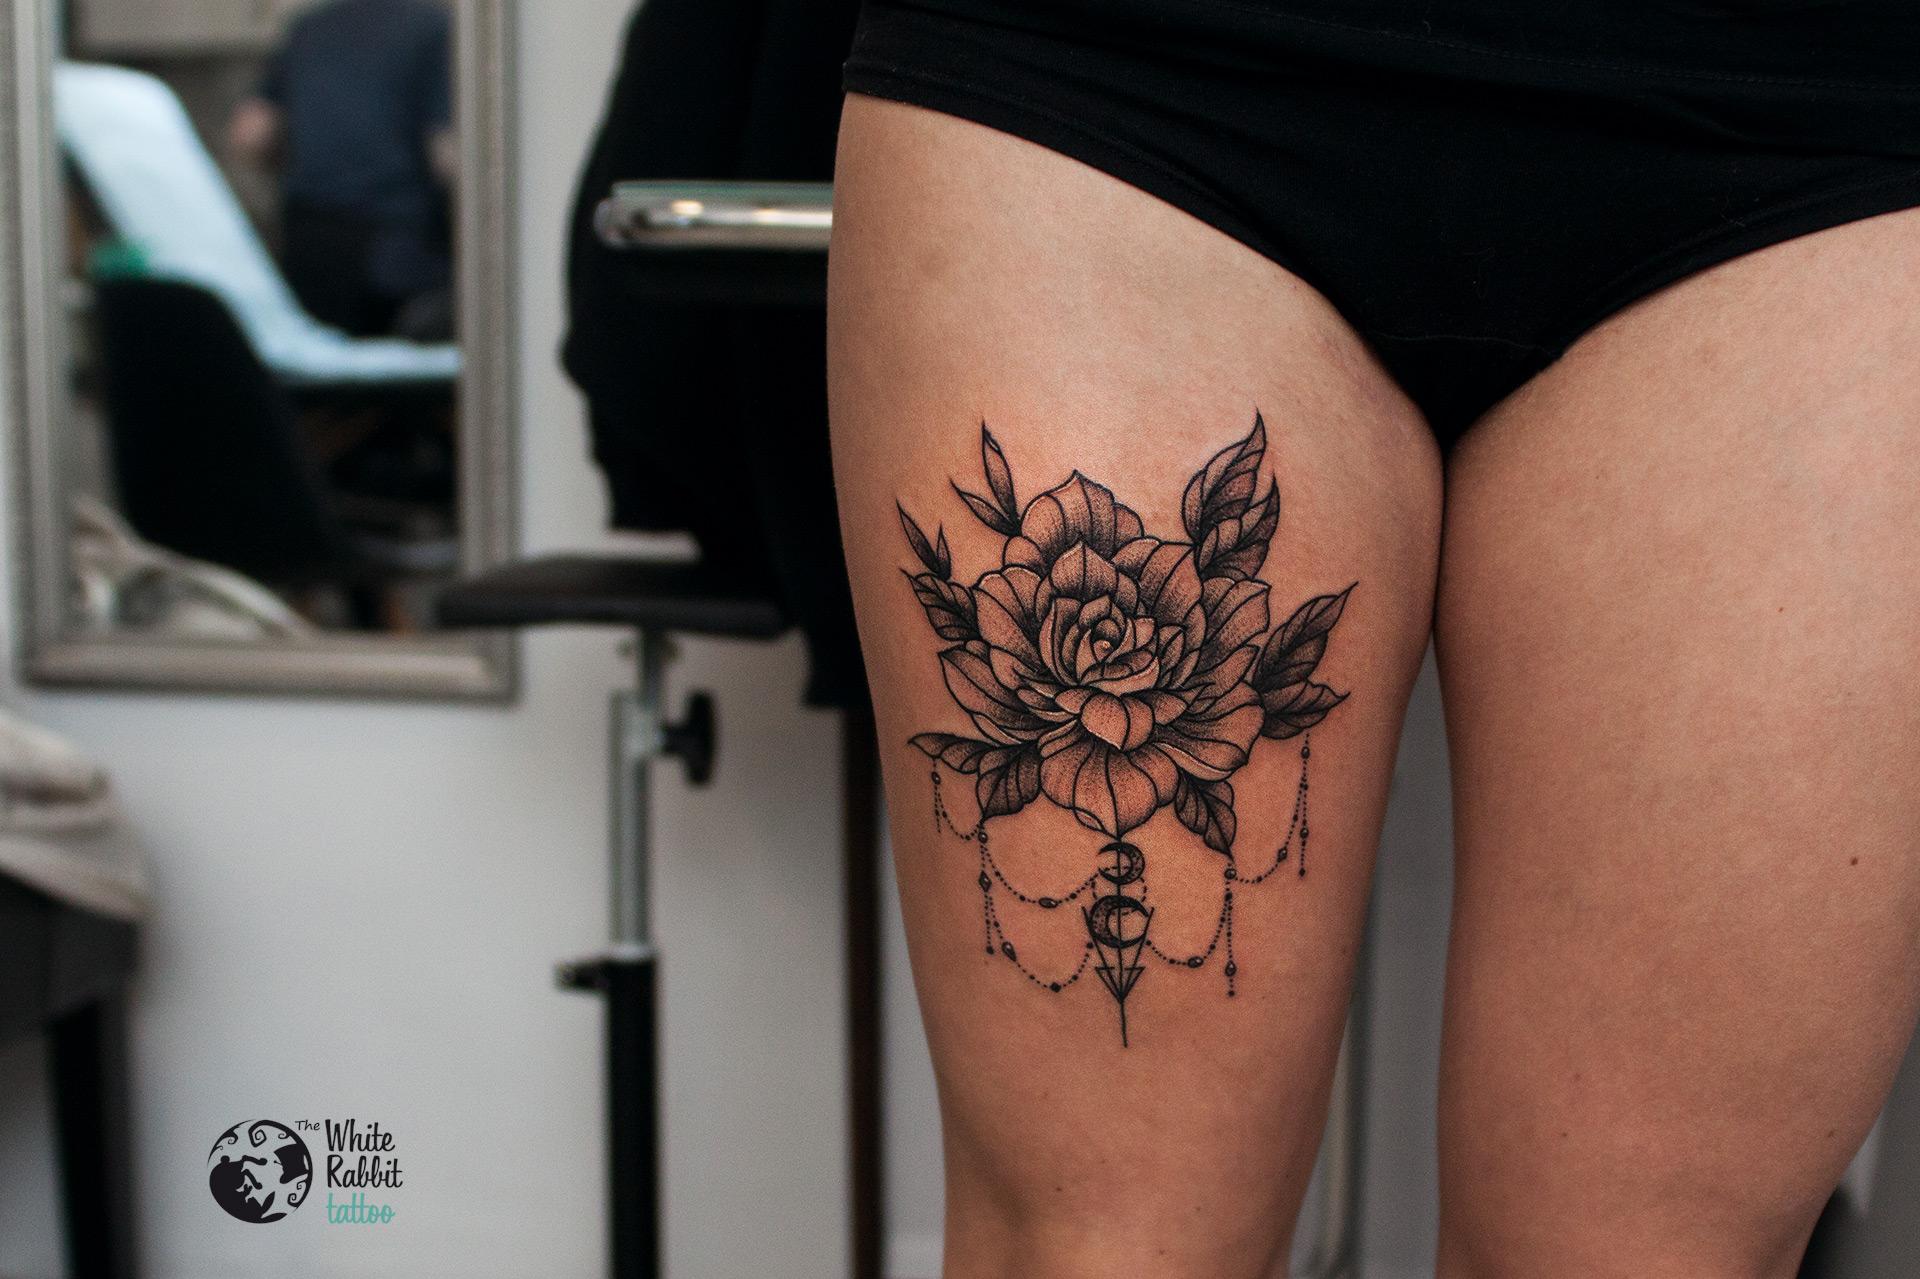 Kwiatowe tatuaże